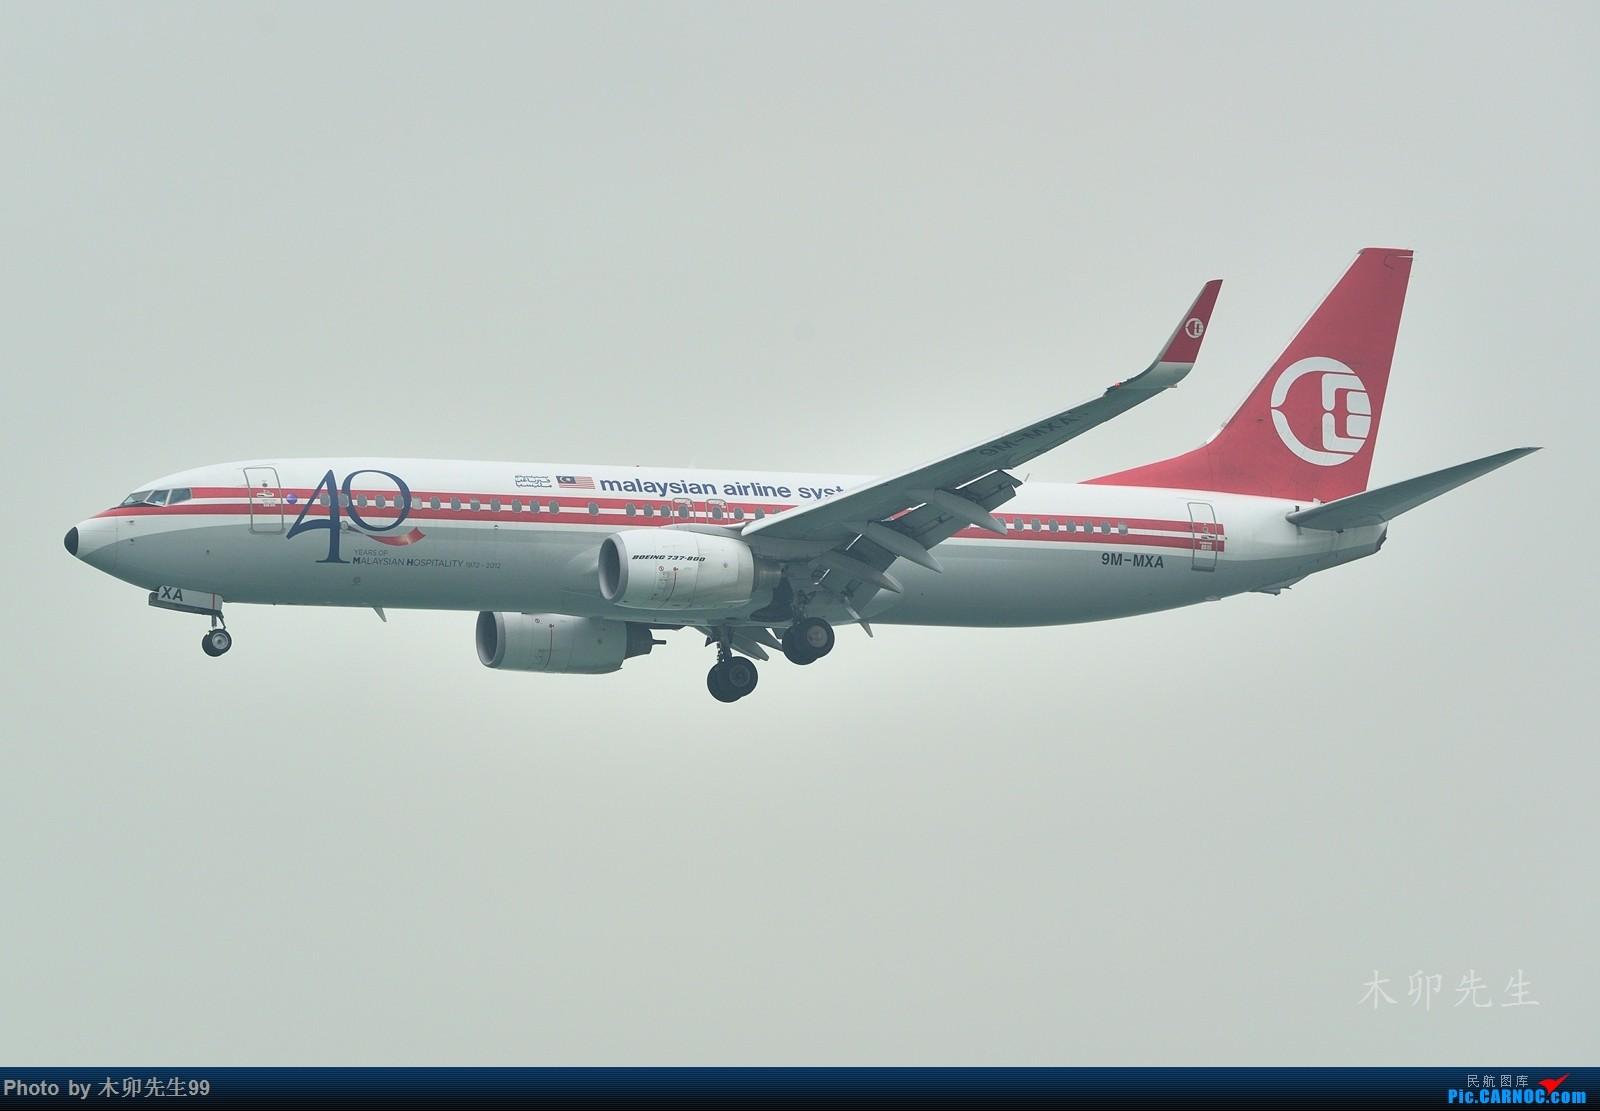 Re:【木卯先生99】——001香港拍机——陆续发一些我的第一次拍摄到的新飞机,供大家欣赏,欢迎您常来看看(陆续添加) BOEING 737-800 9M-MXA 香港赤鱲角国际机场